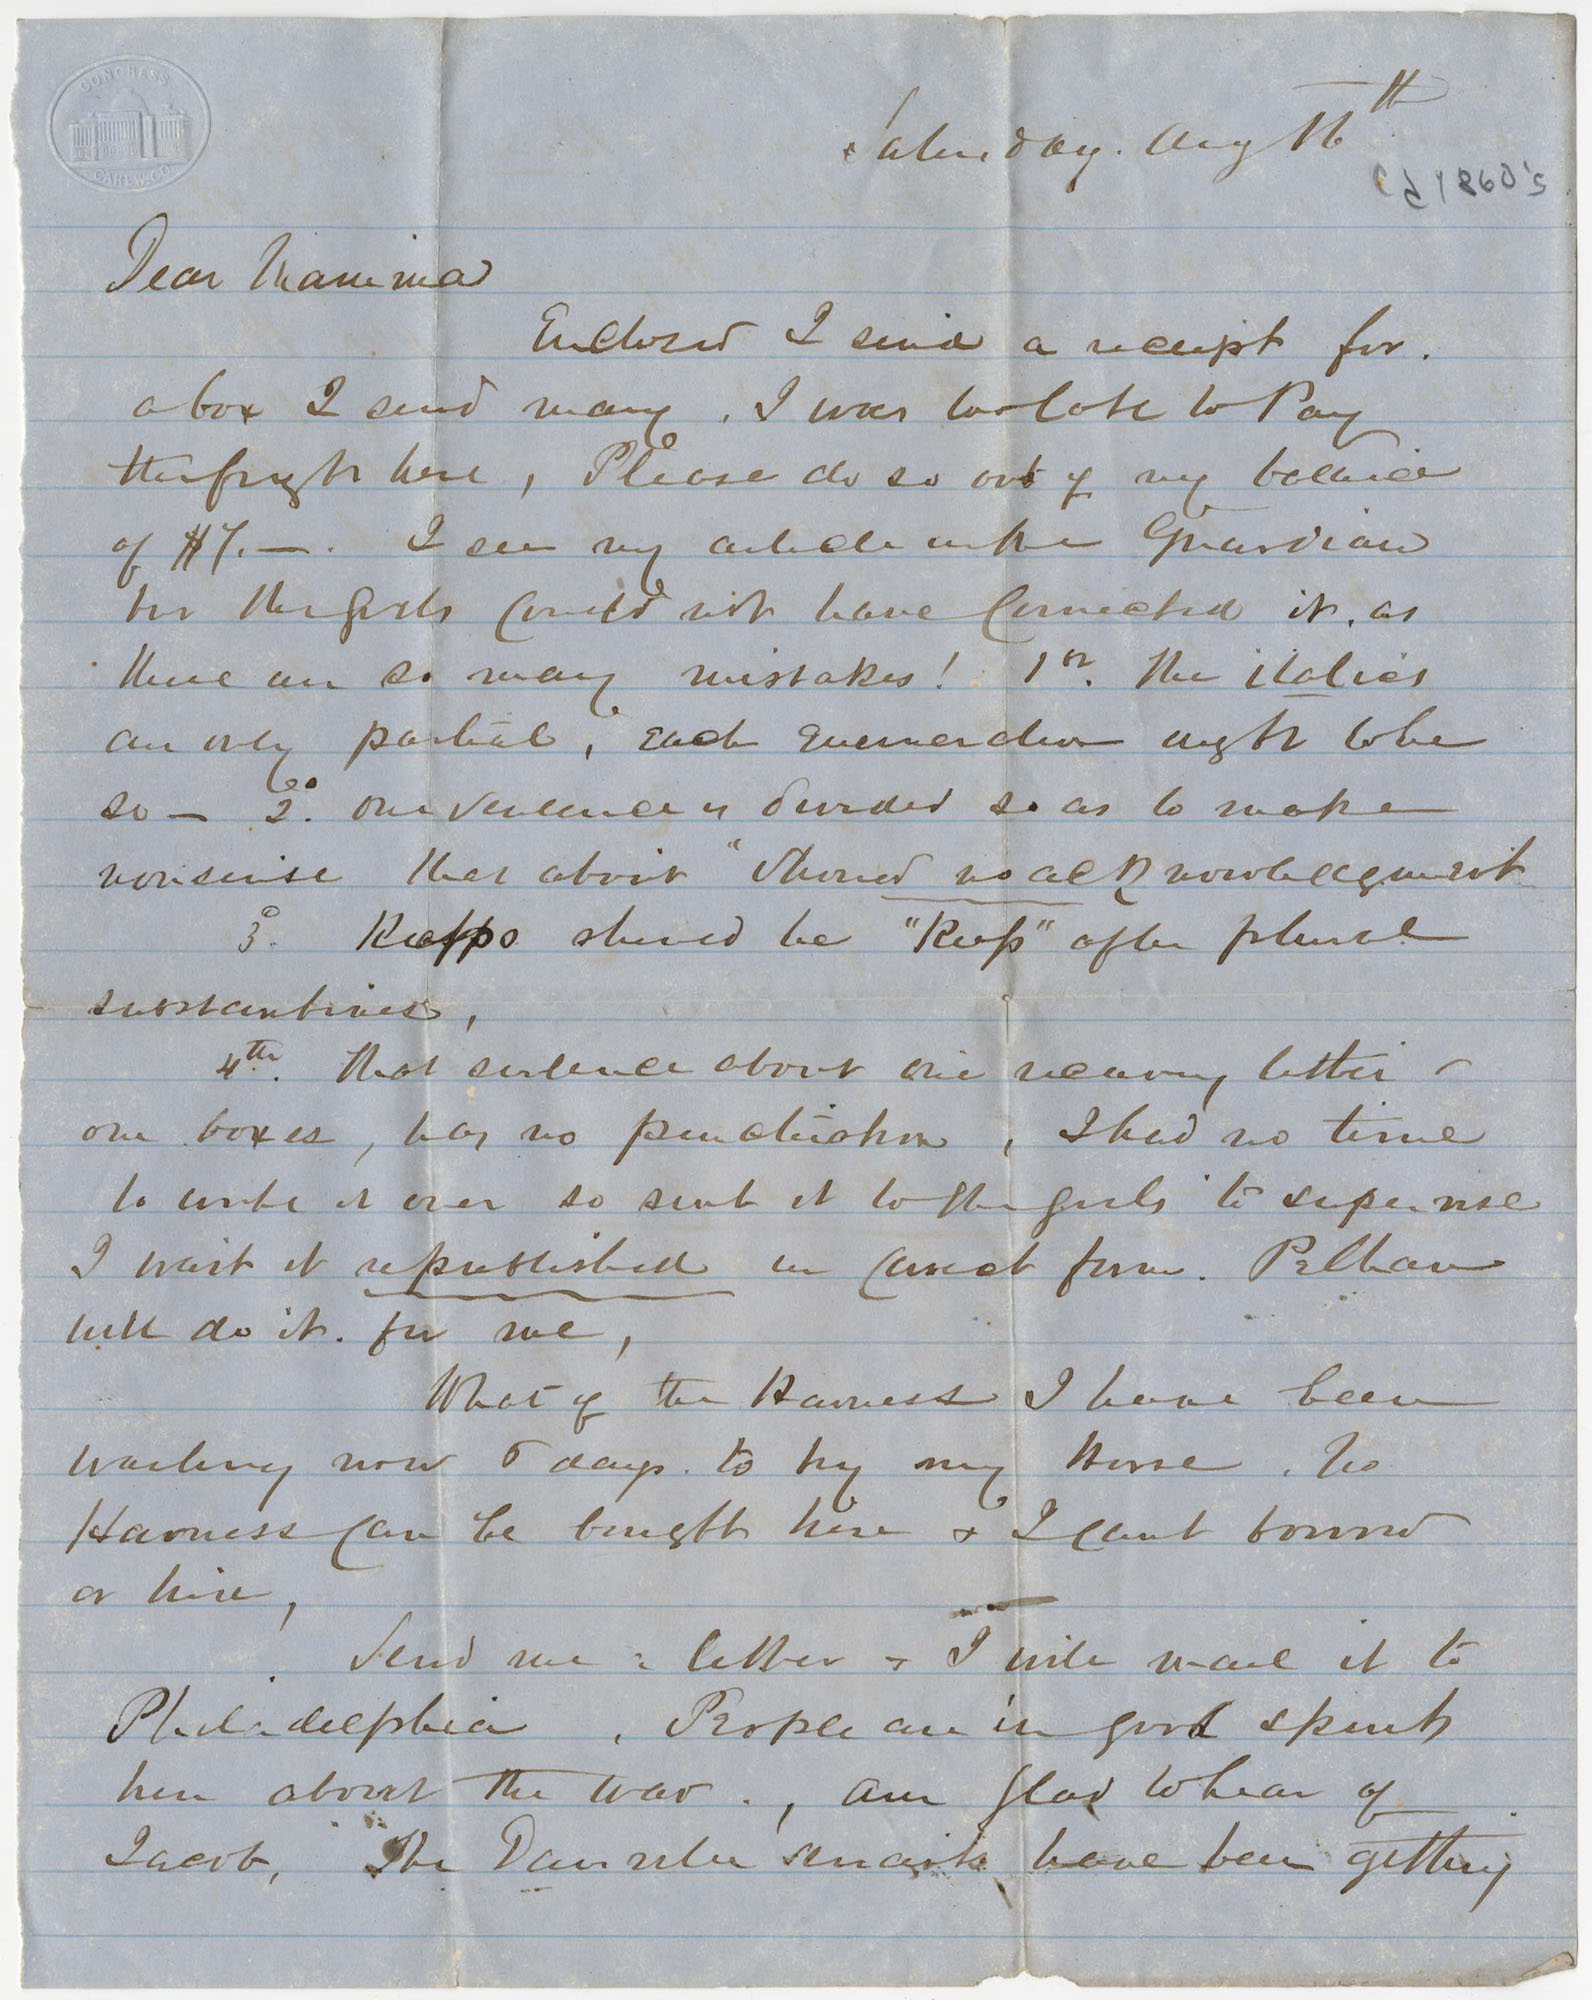 382.  Robert Woodward Barnwell to Catherine Osborn Barnwell  -- ca. 1862